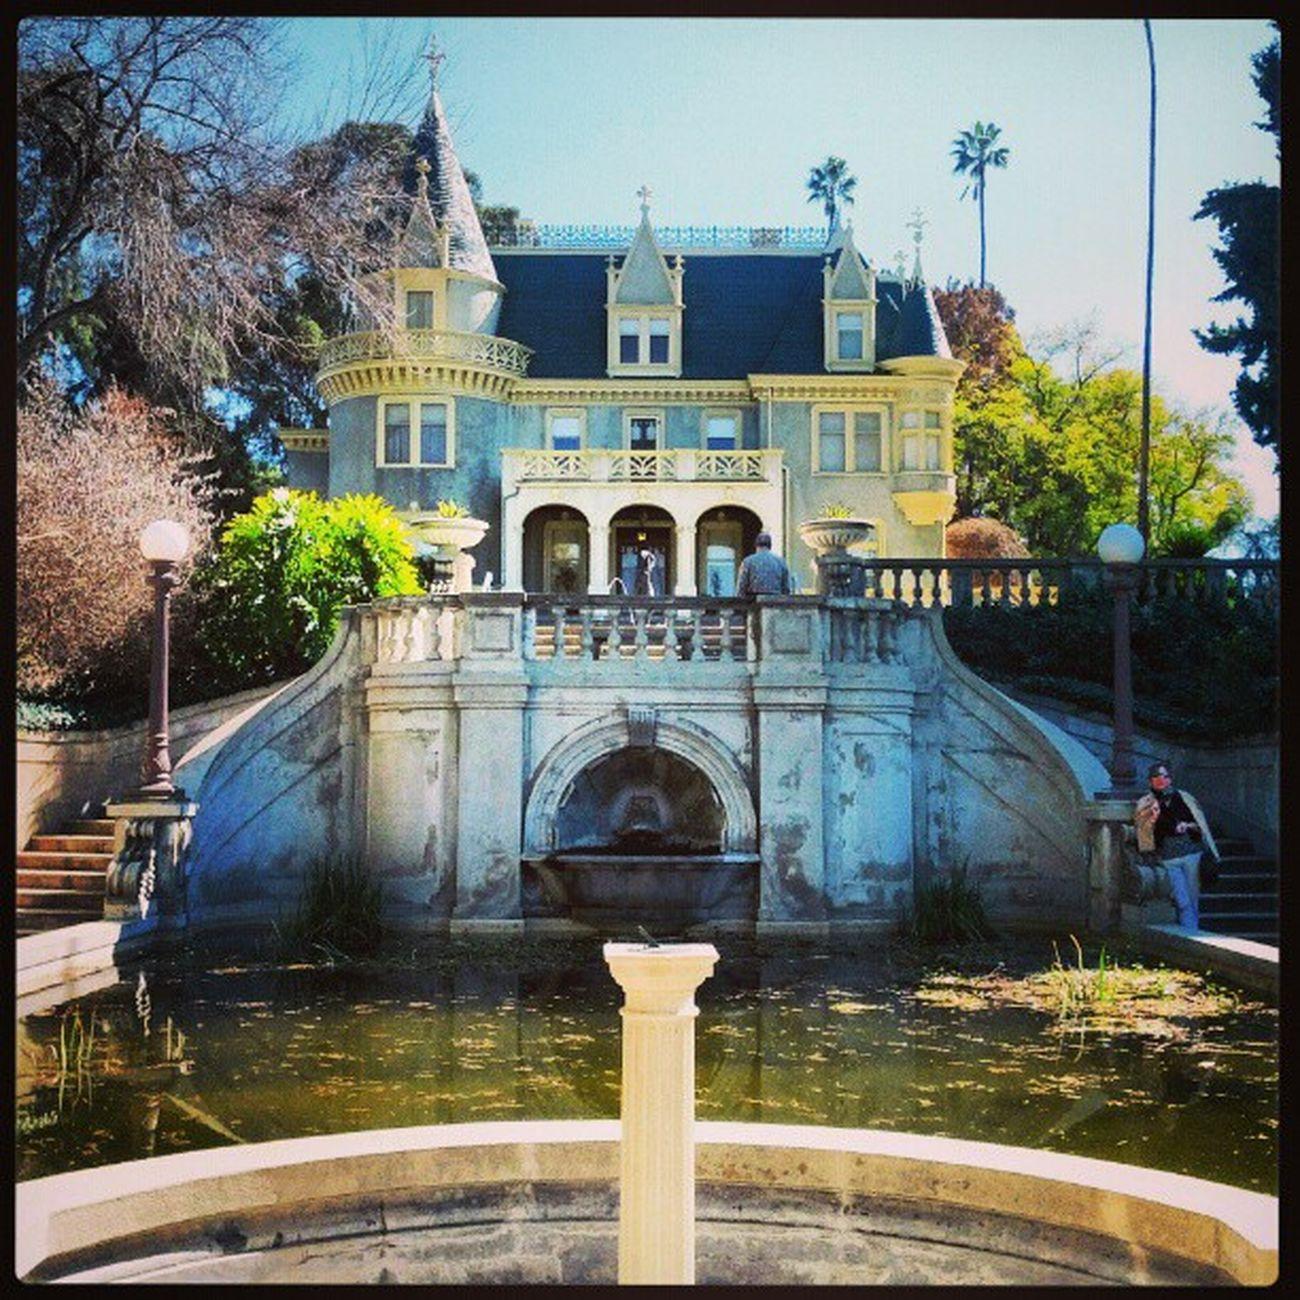 Kimberlycresthouse Redlands SoCal Himom garden pond stairs vintage antique